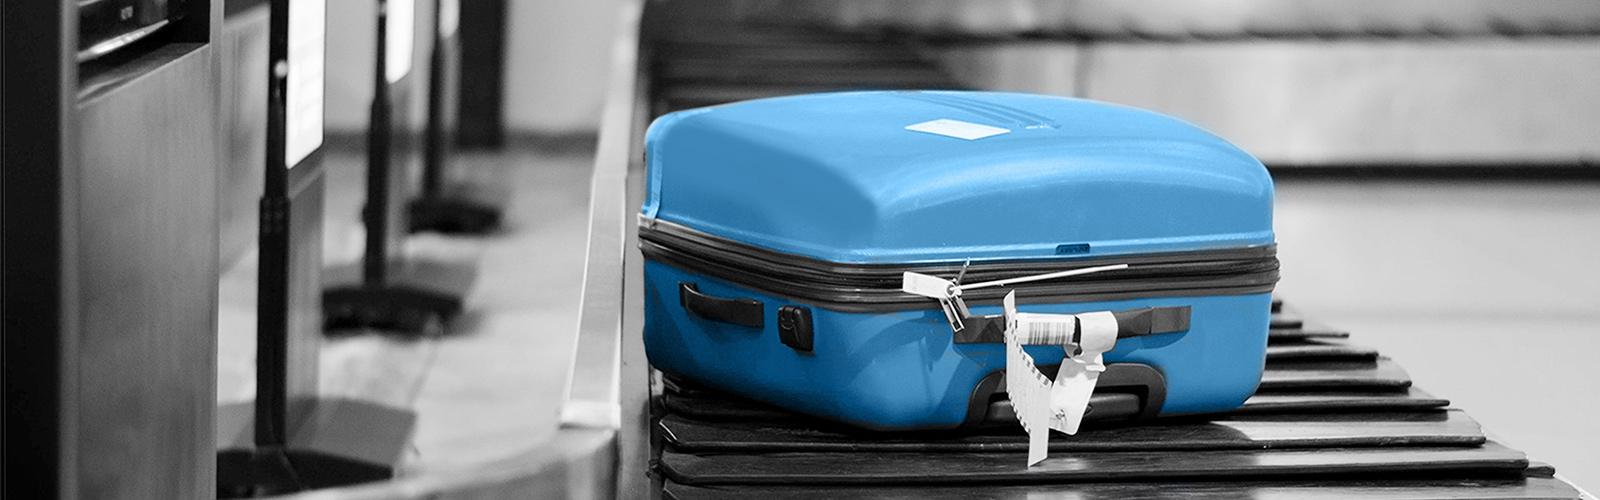 Traitement valise